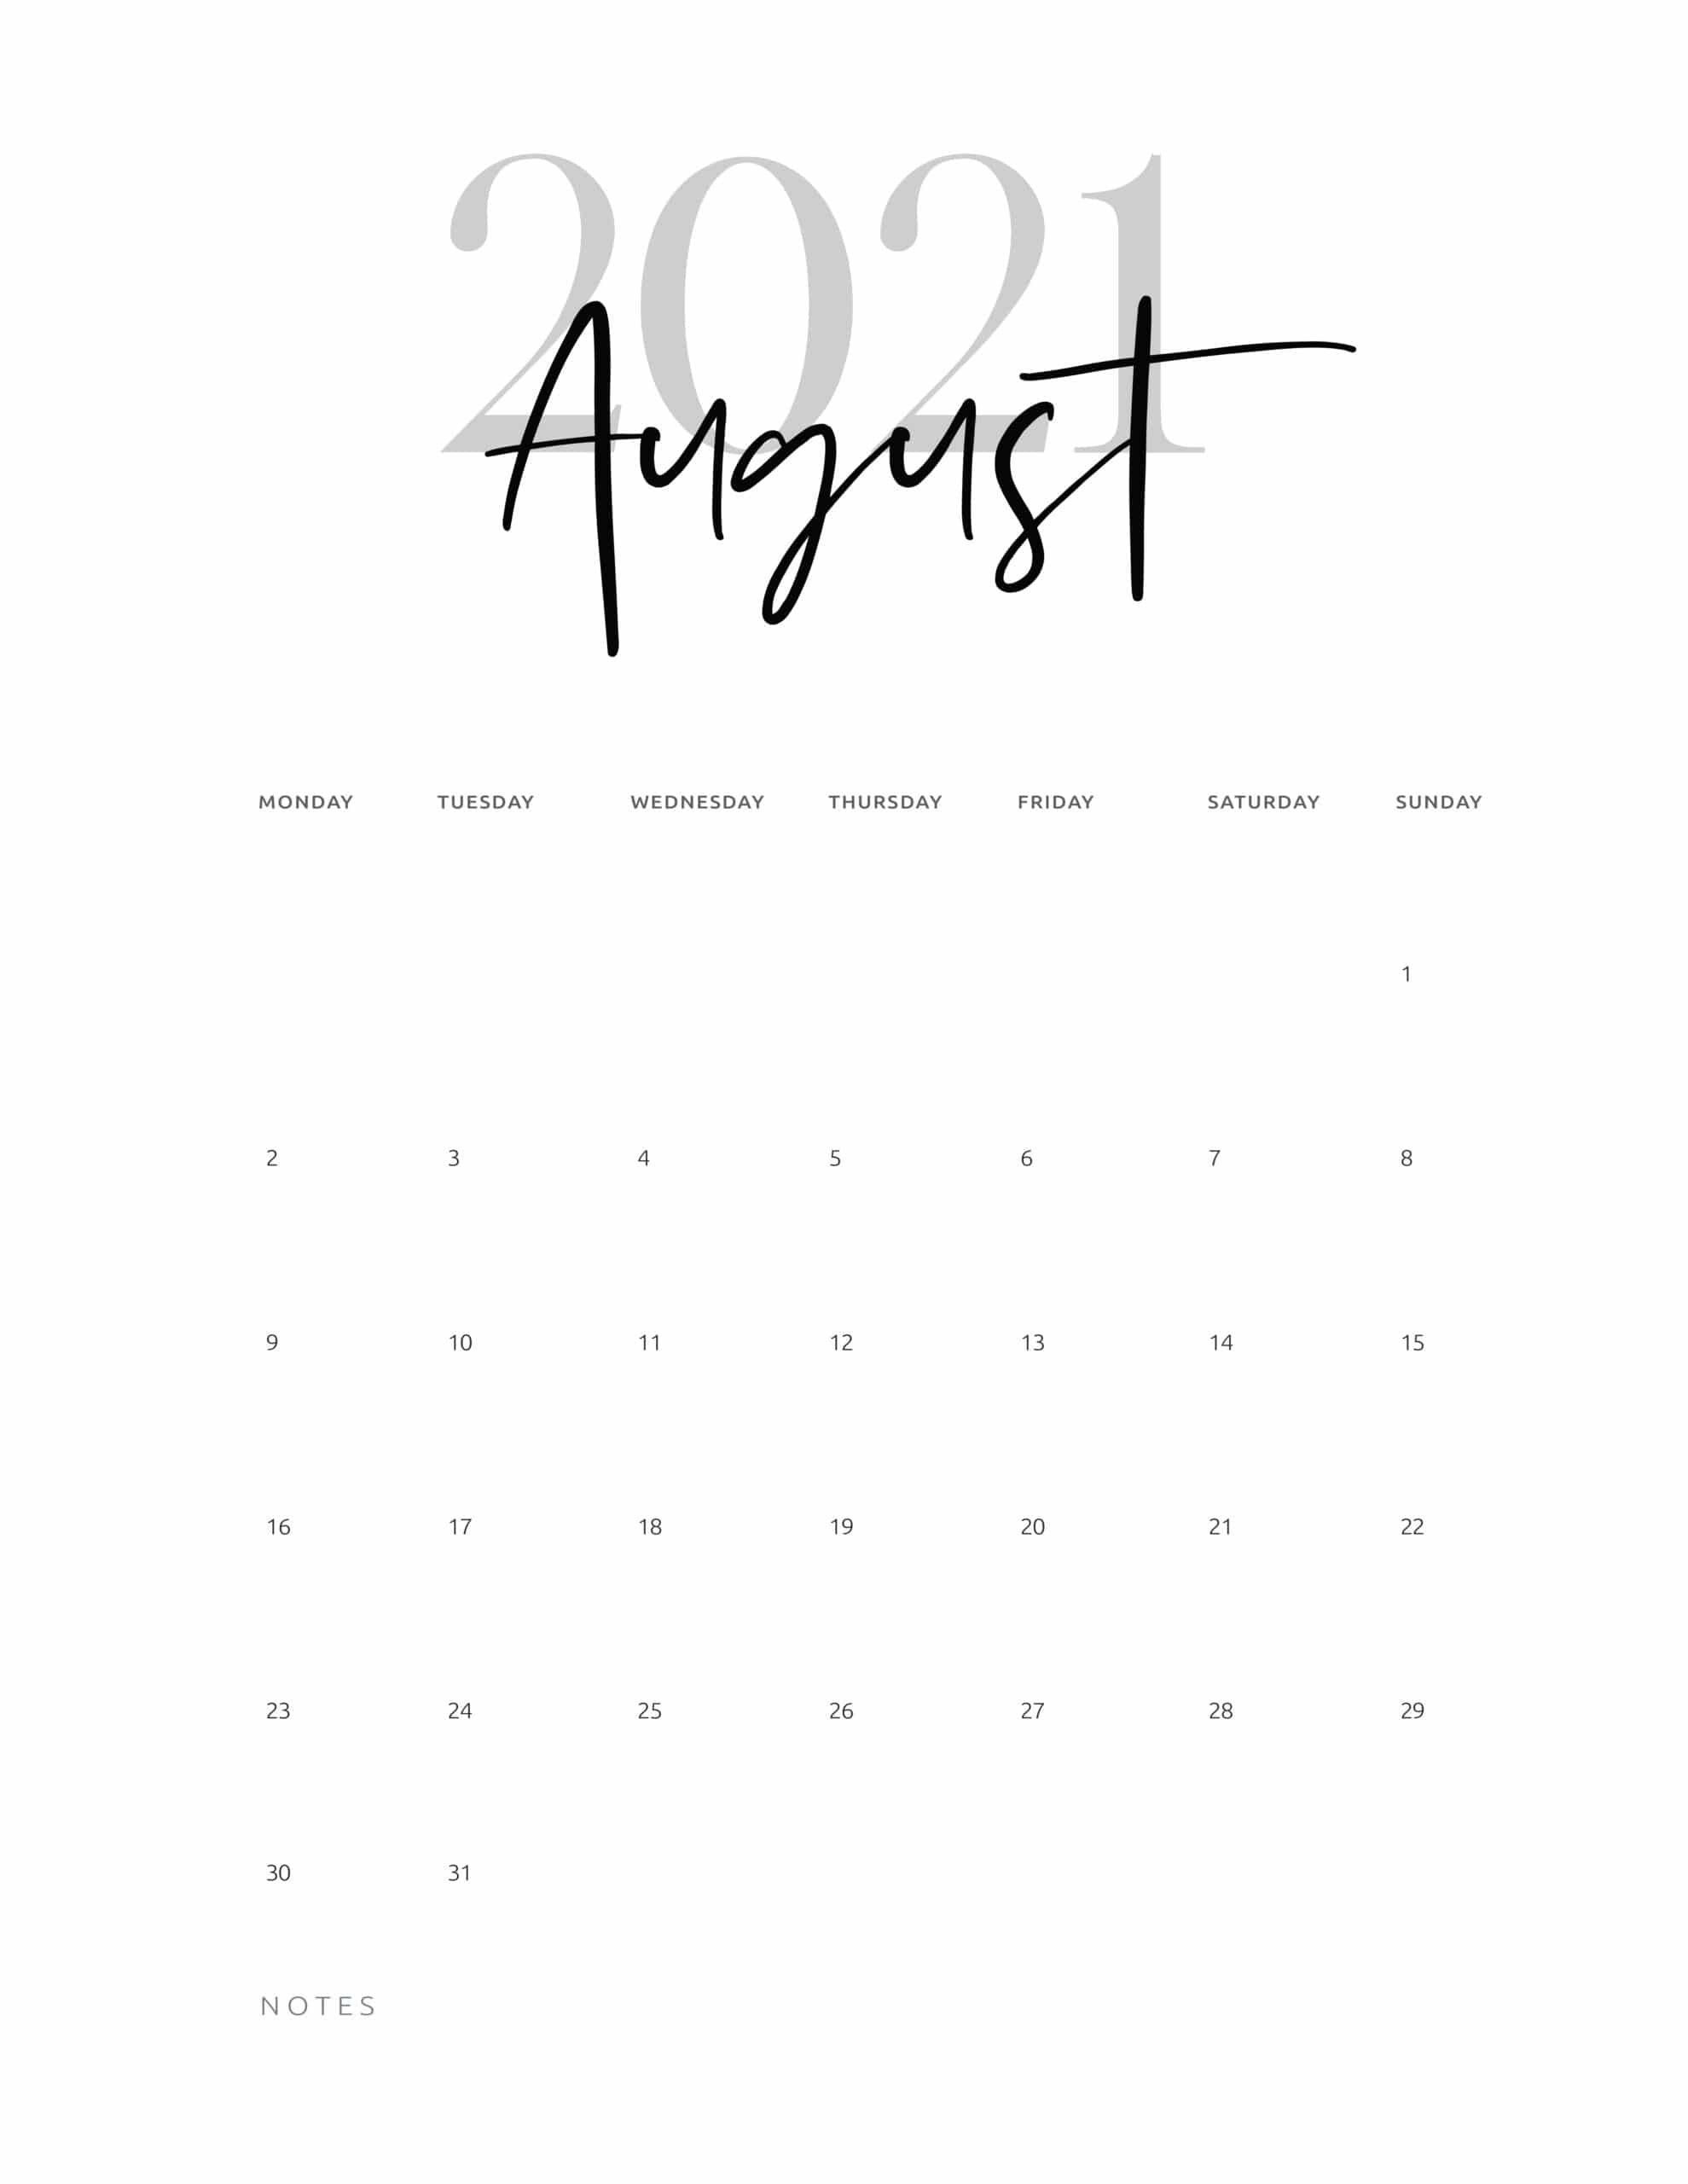 2021 Calendar Printable Cursive - World Of Printables with regard to What Year Calendar Matches 2021